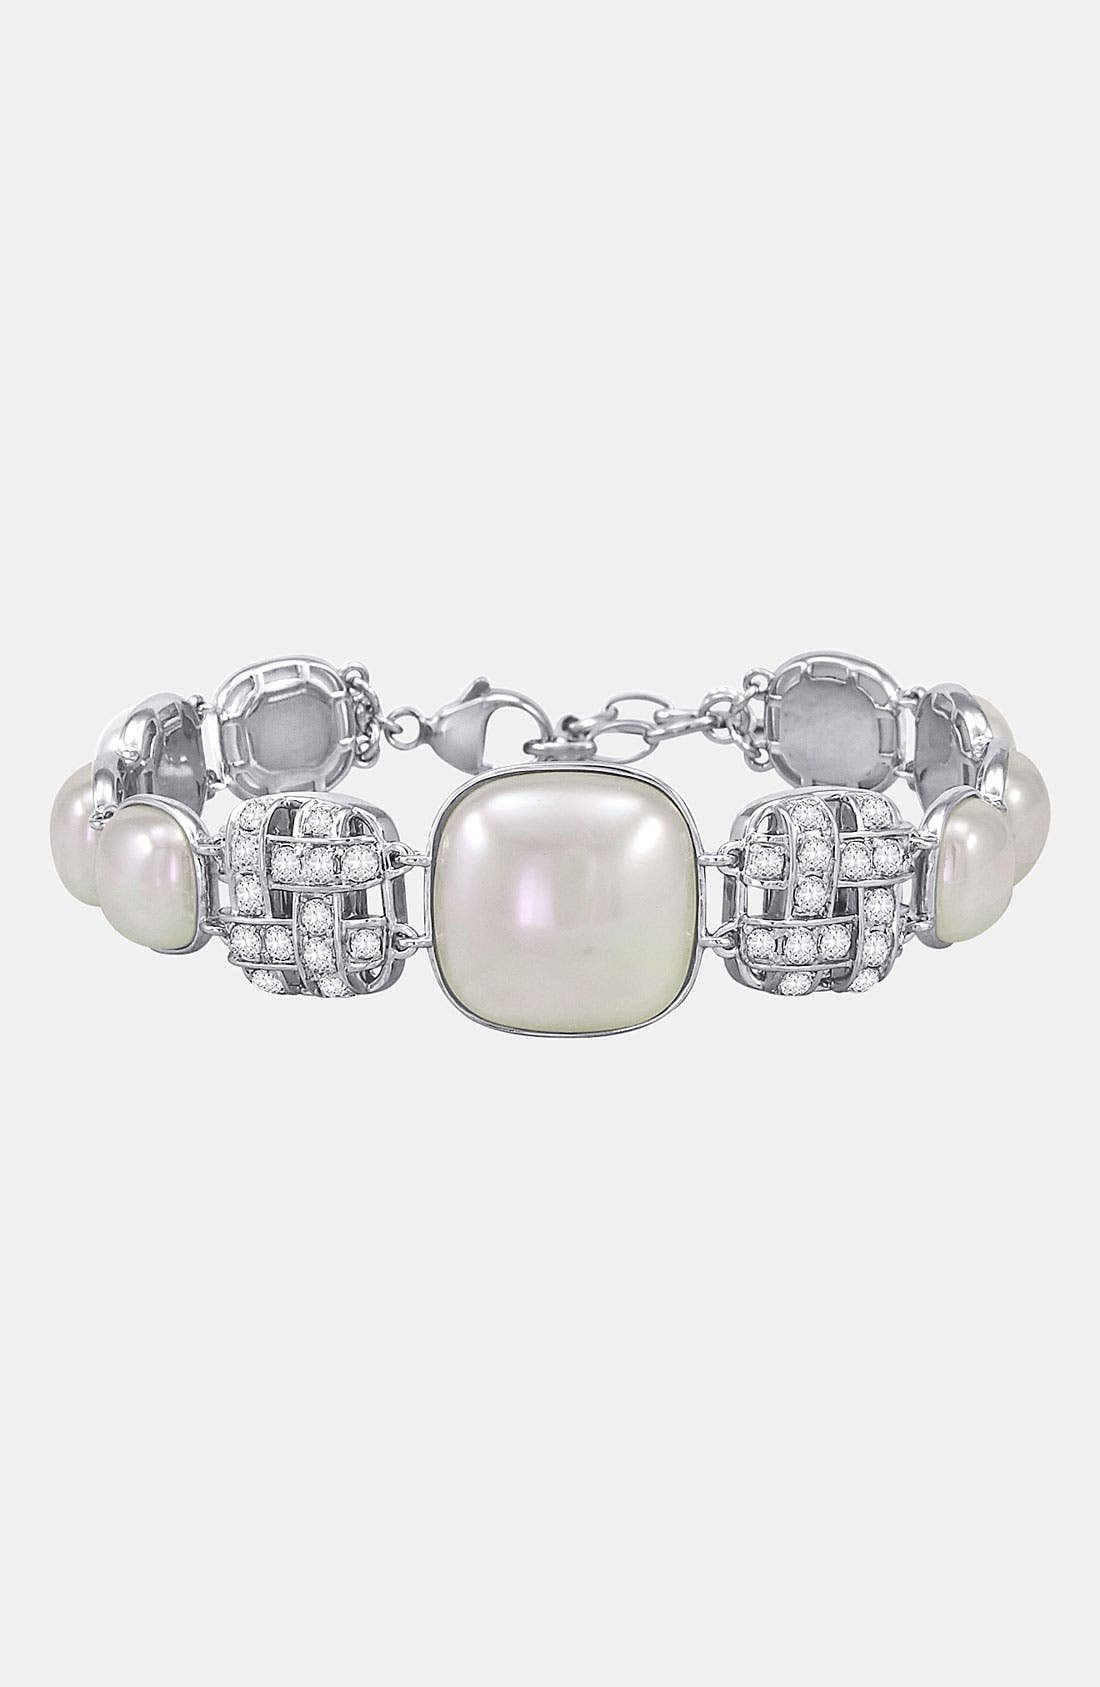 Main Image - Majorica 'Graphic Contrast' Pearl & Cubic Zirconia Bracelet